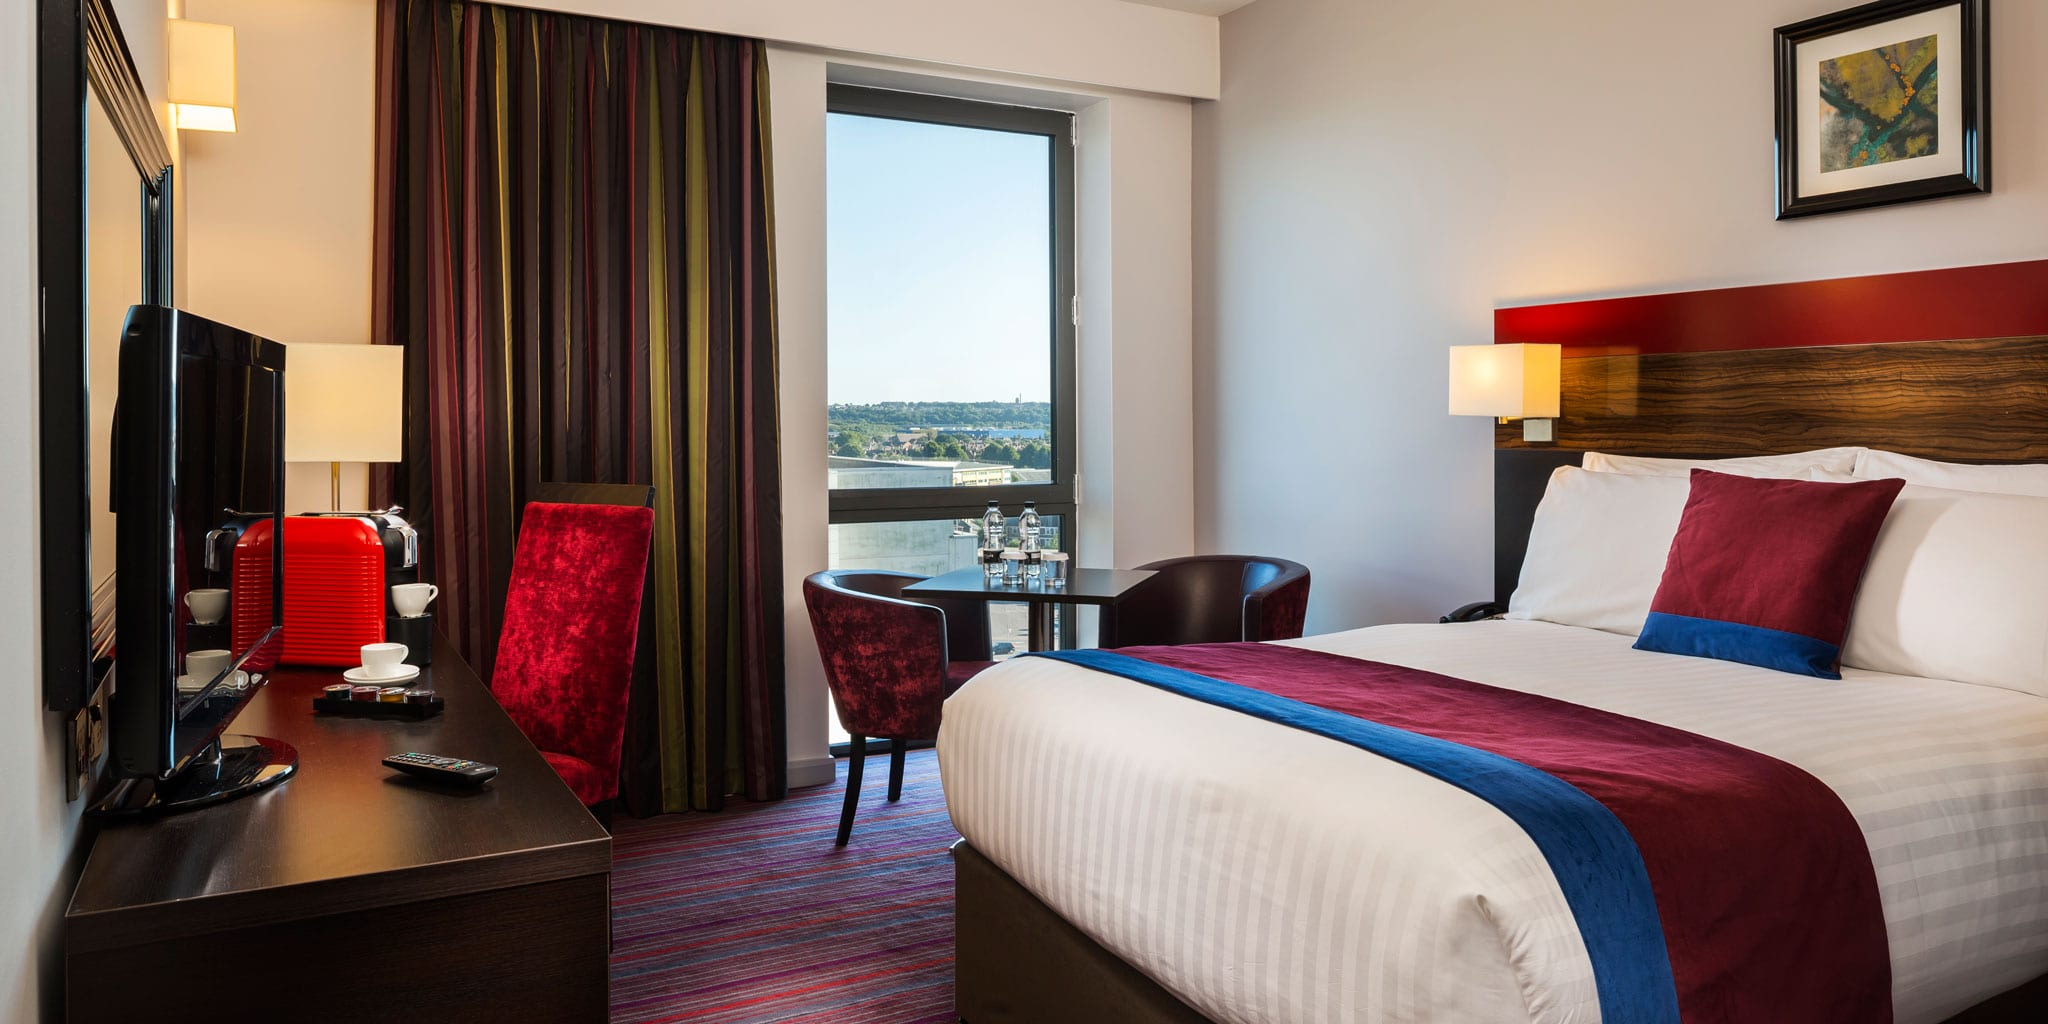 clayton-hotel-cardiff-room (1)